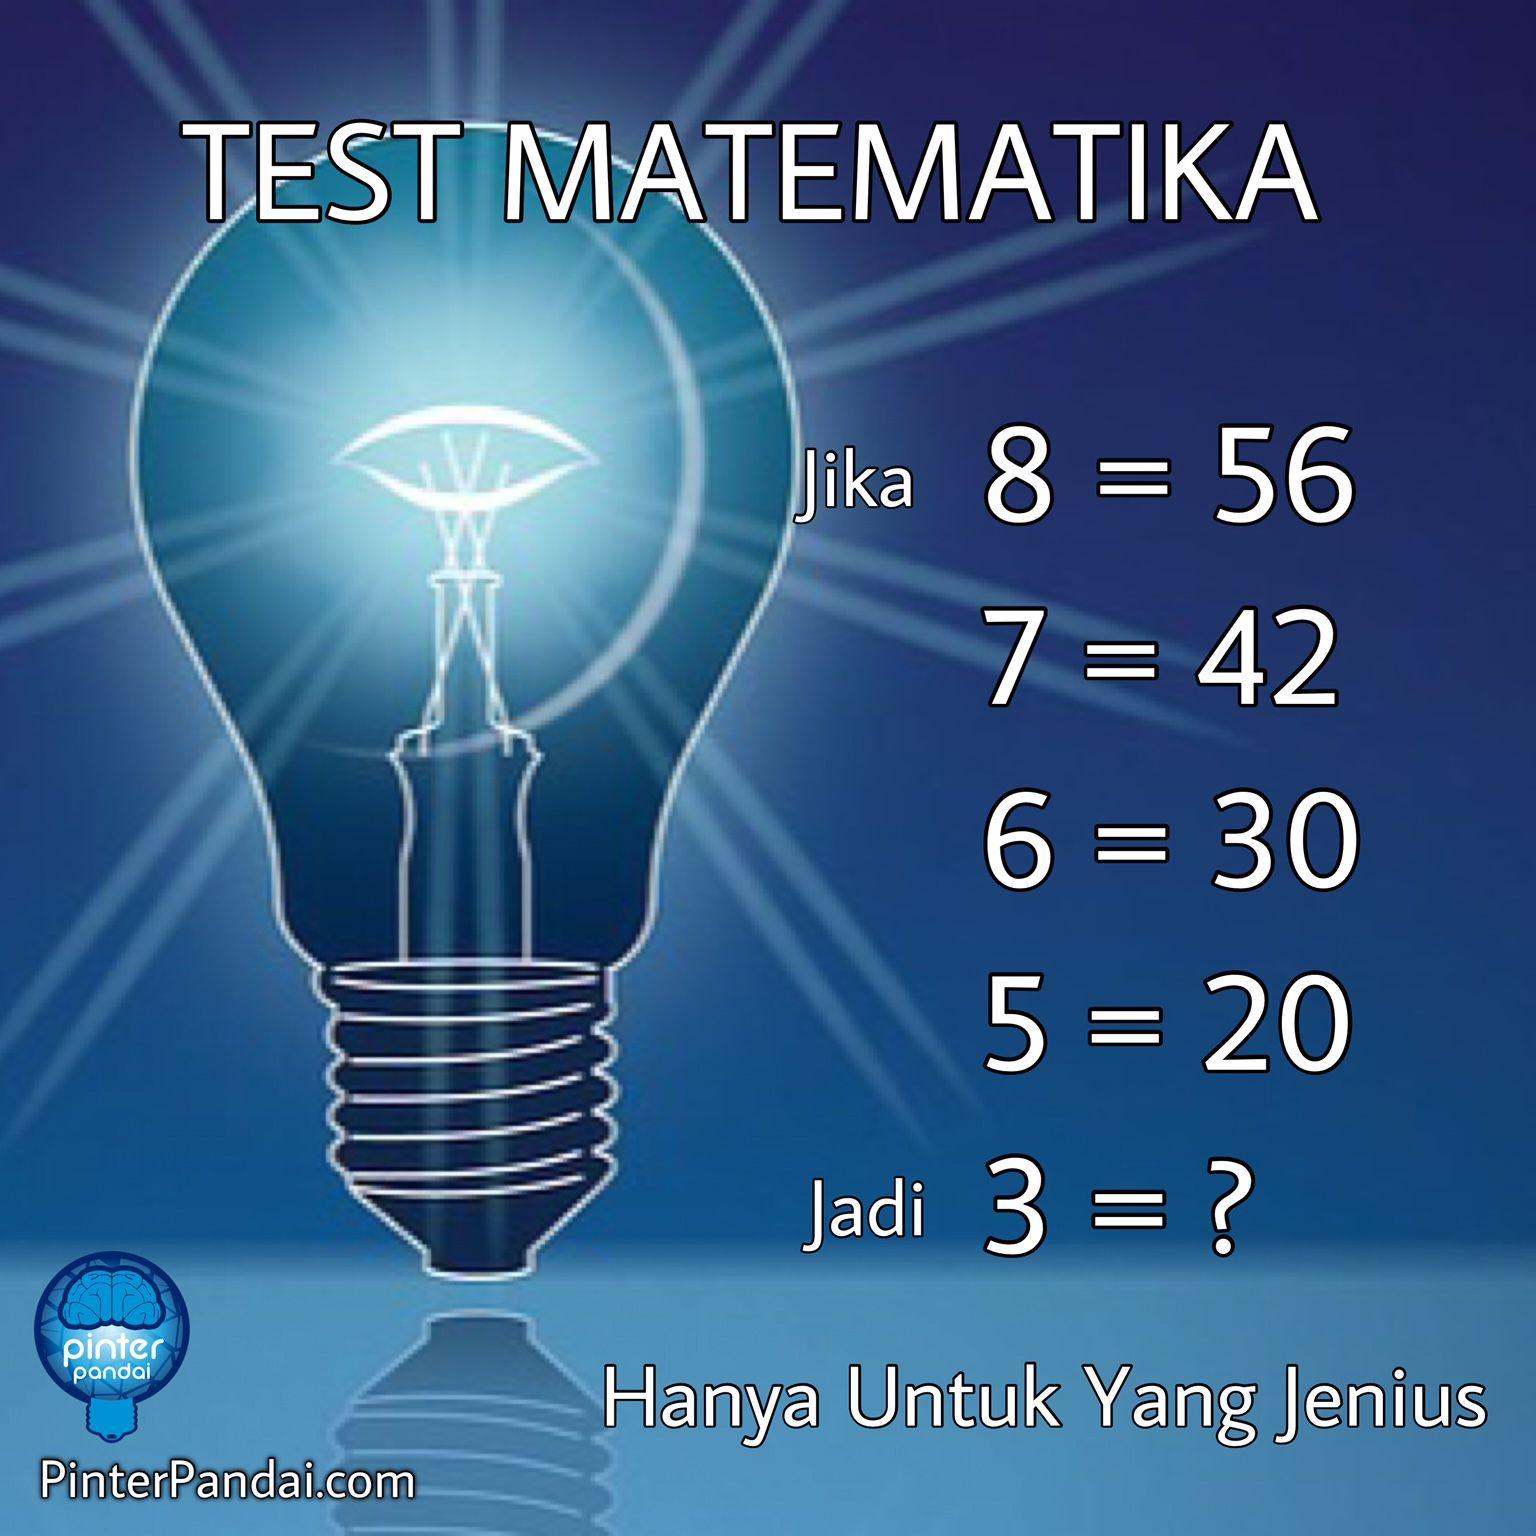 Tes Matematika Deret Angka 8 56 7 42 6 30 5 20 Jadi 3 Matematika Belajar